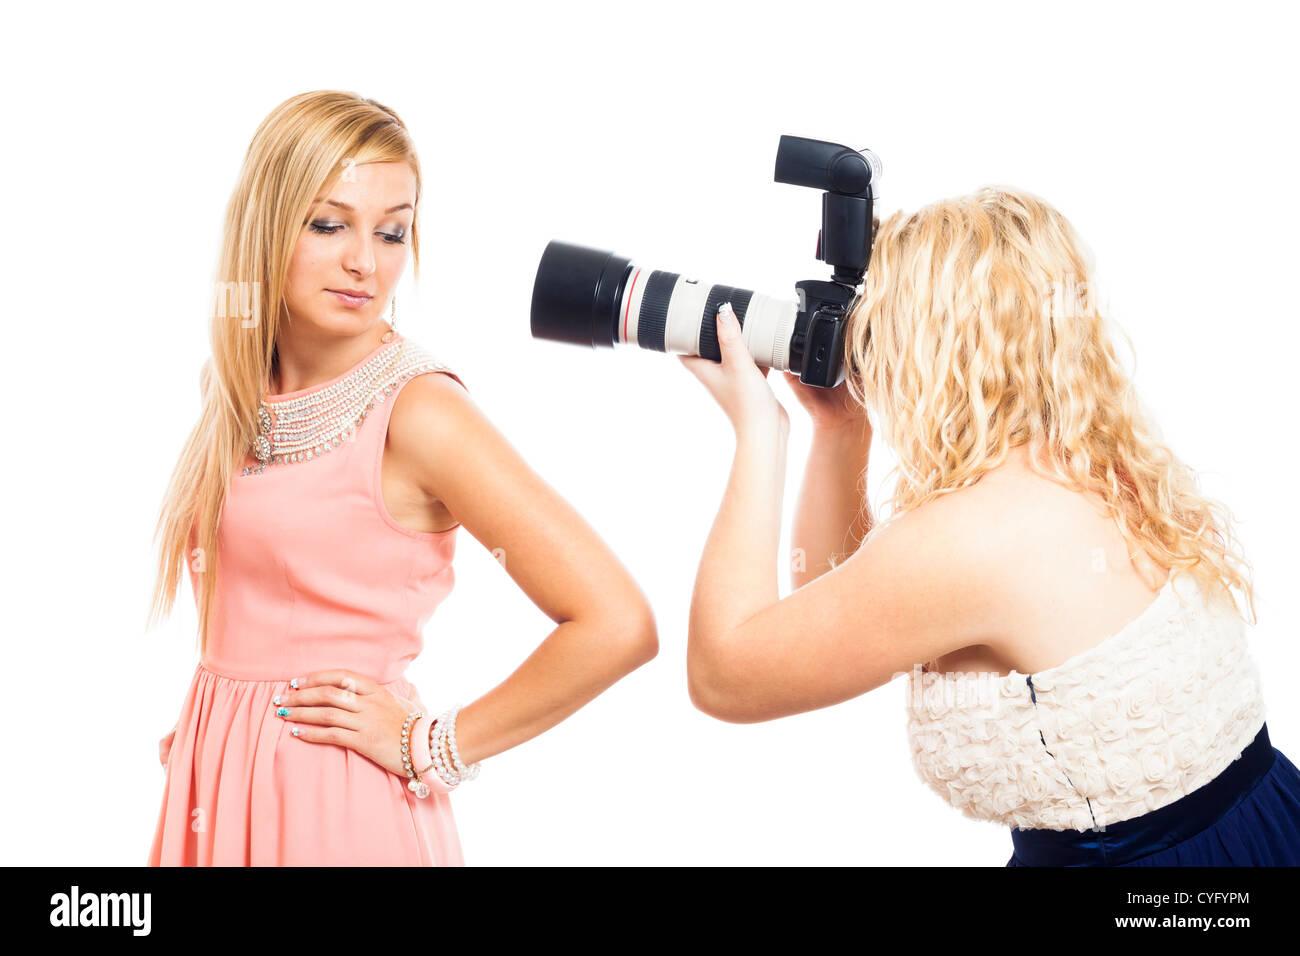 Fashion female photographer working with model, isolated on white background. - Stock Image